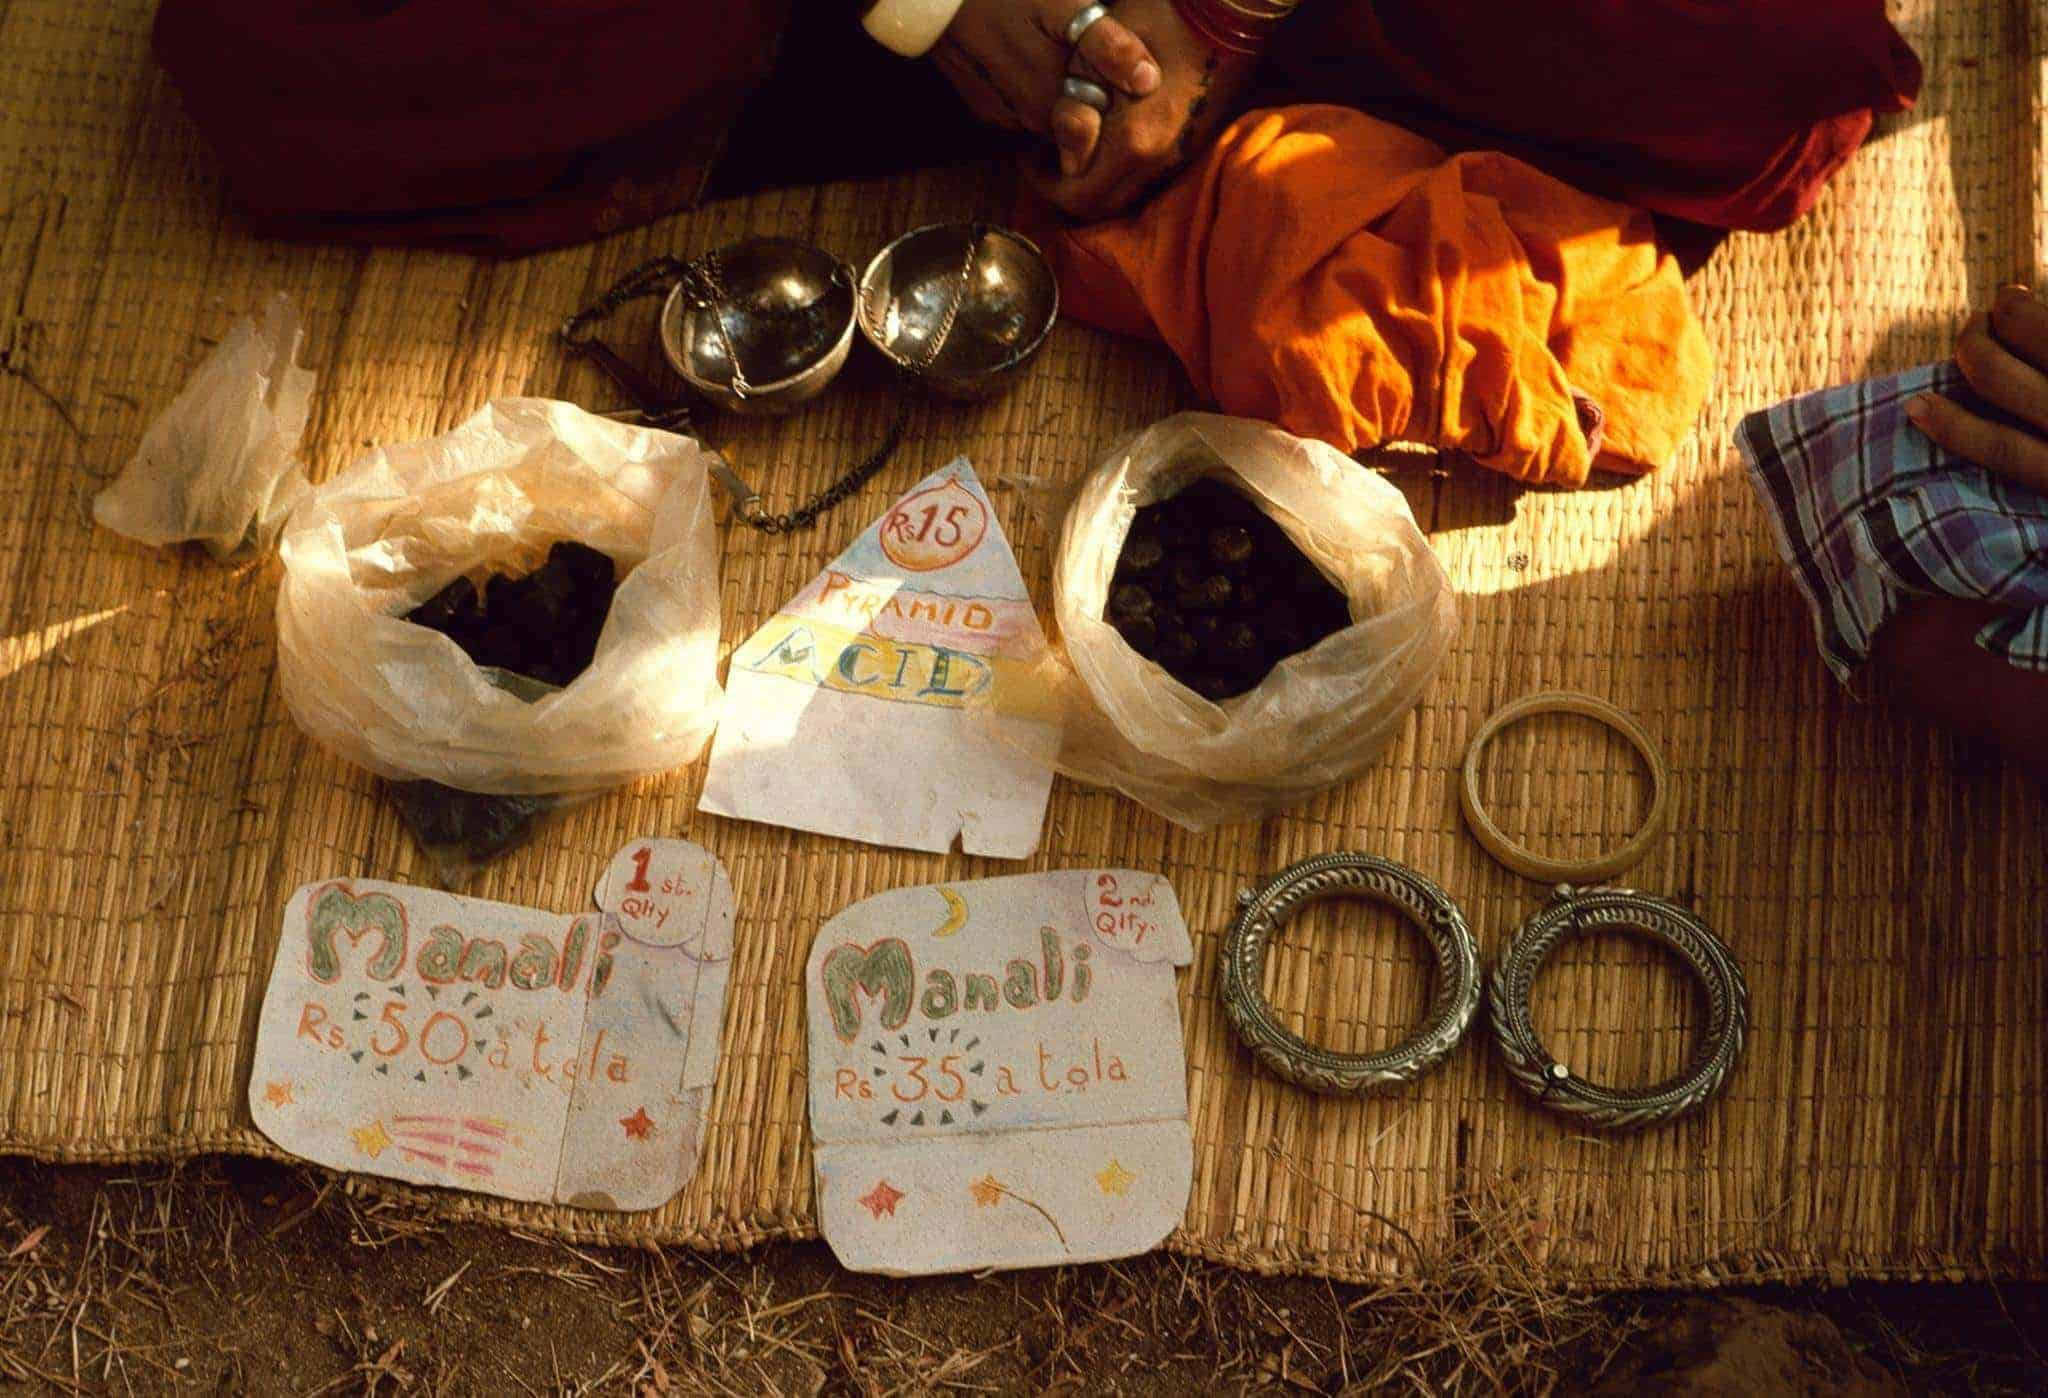 Selling Charas (Hashish) from Manali, LSD and jewellery in Anjuna flea market, Goa, 1976 (Photo by Michel Hilzinger).